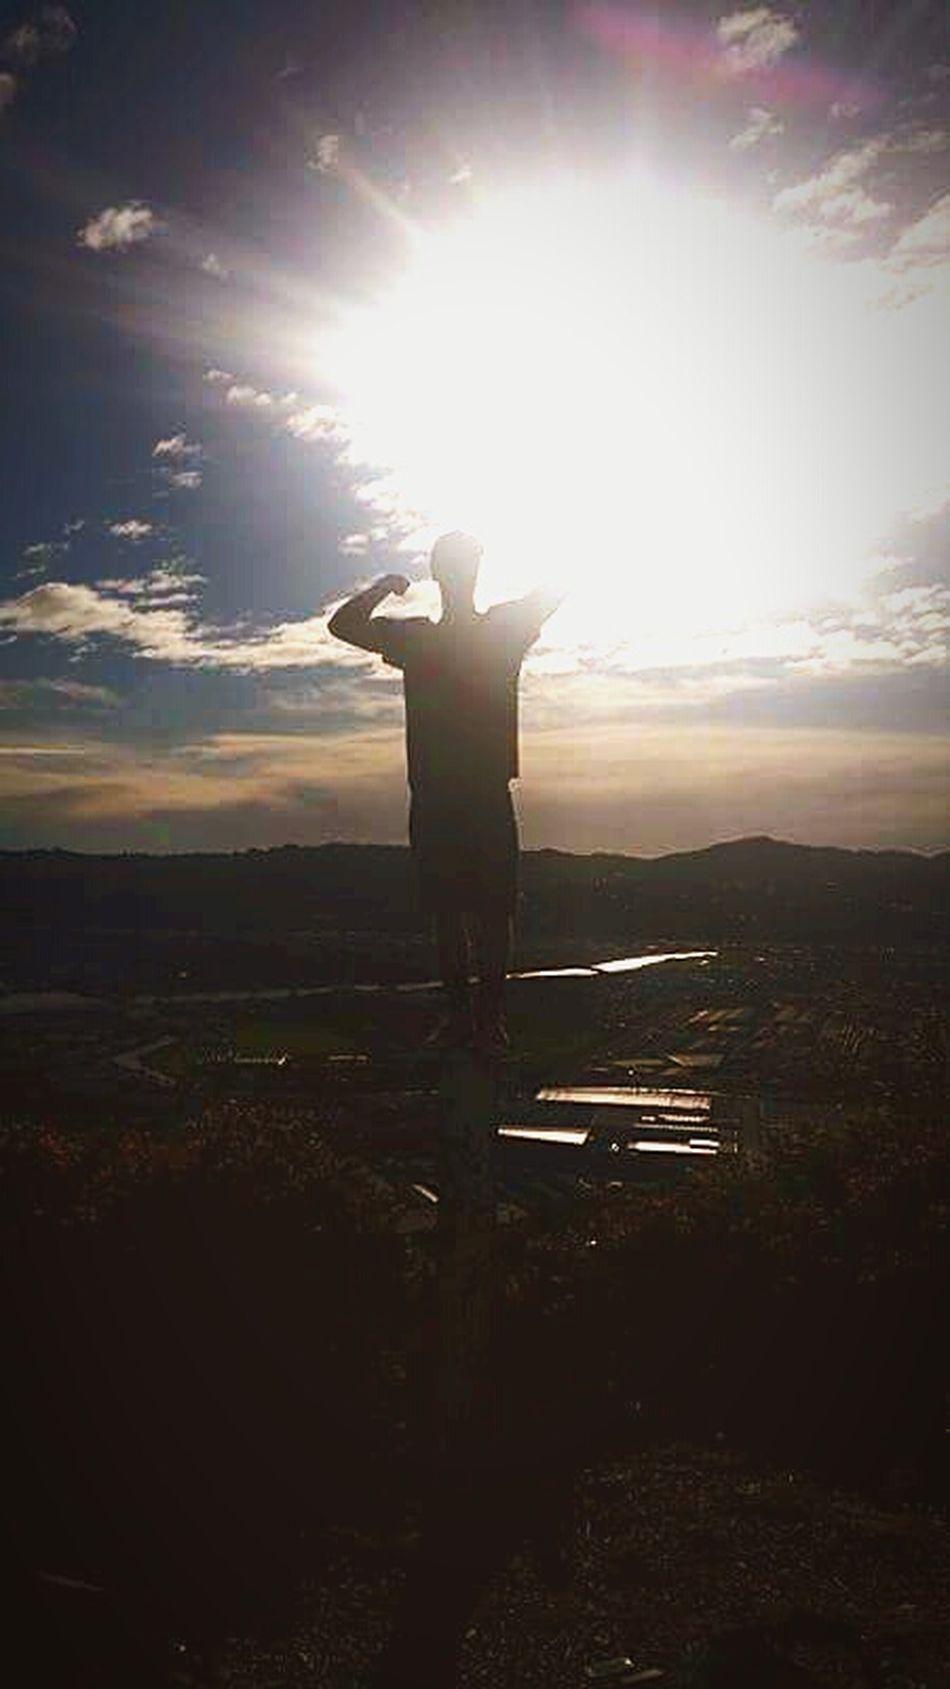 Sunbeam Sun Standing Full Length Tranquil Scene Cloud - Sky Tranquility Back Lit Lens Flare Vacations Horizon Over Land Beauty In Nature Non-urban Scene Memories Sunlight Silhouette Tourism Day Nature Scenics Sky NeverGonnaStop Believeinyourself Believe Shower